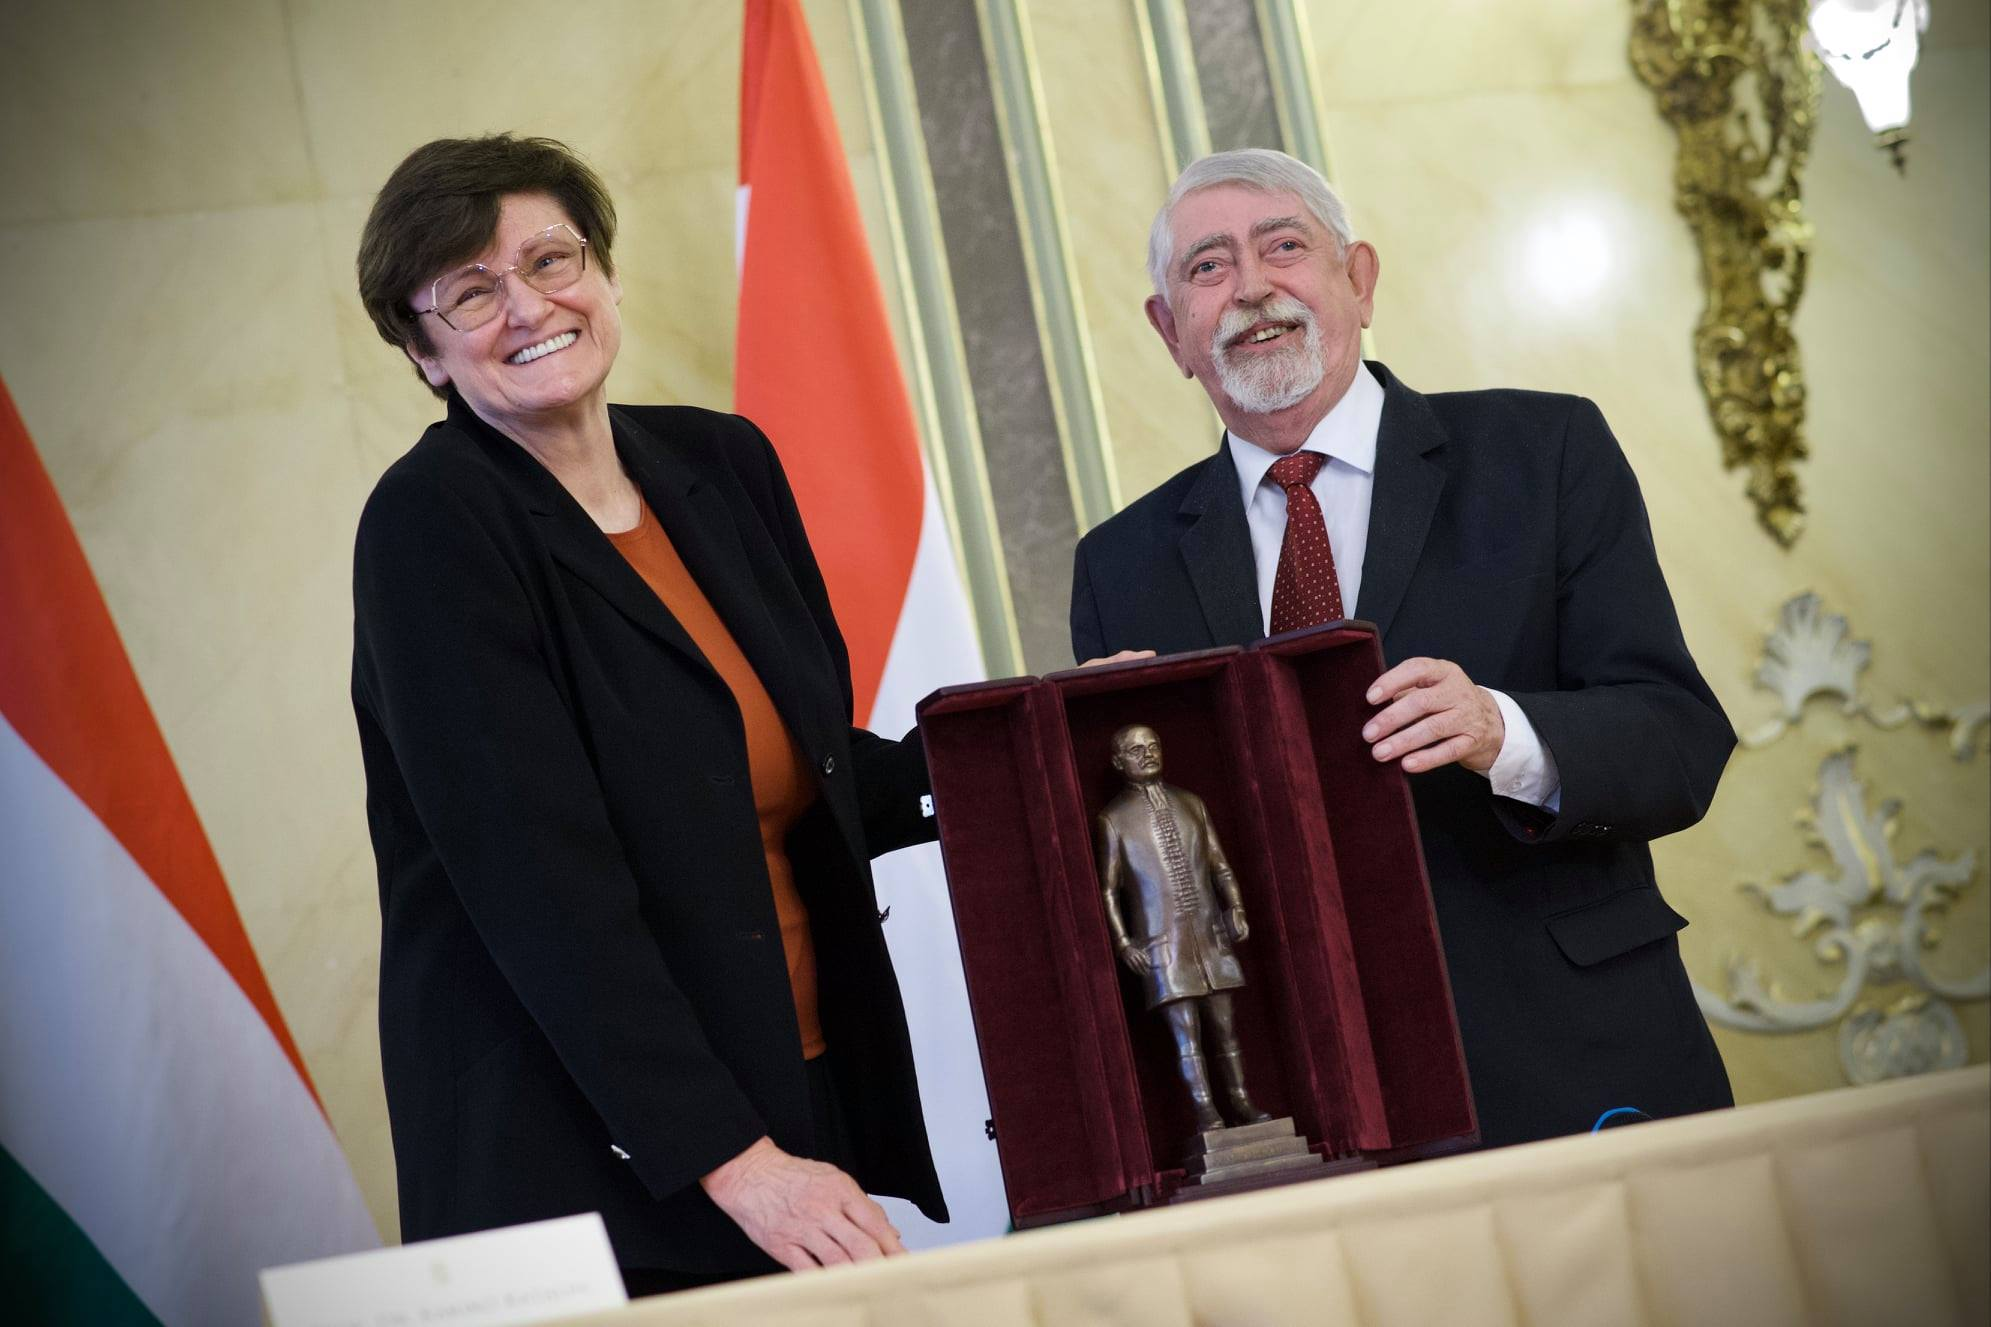 Biochemikerin Karikó erhält Semmelweis-Preis